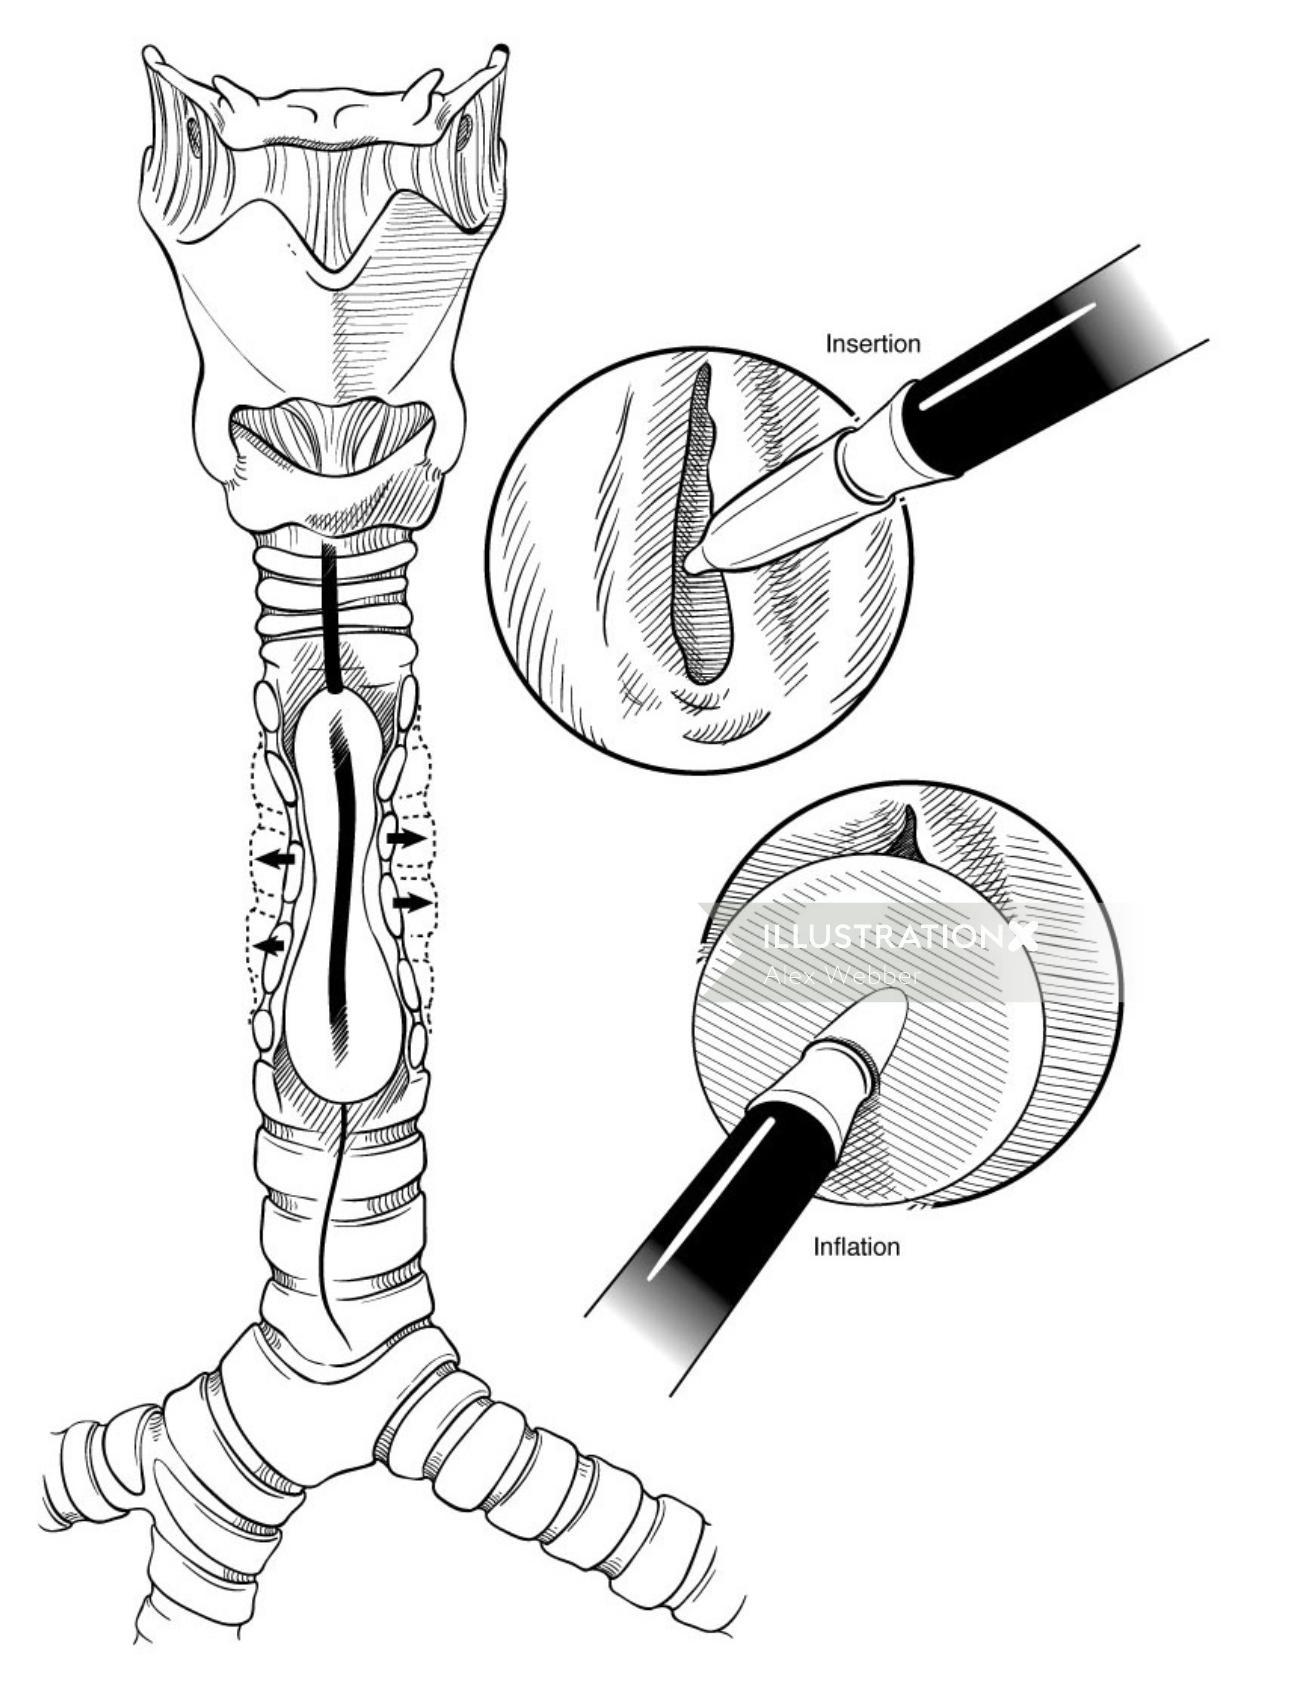 Medical illustration of operation